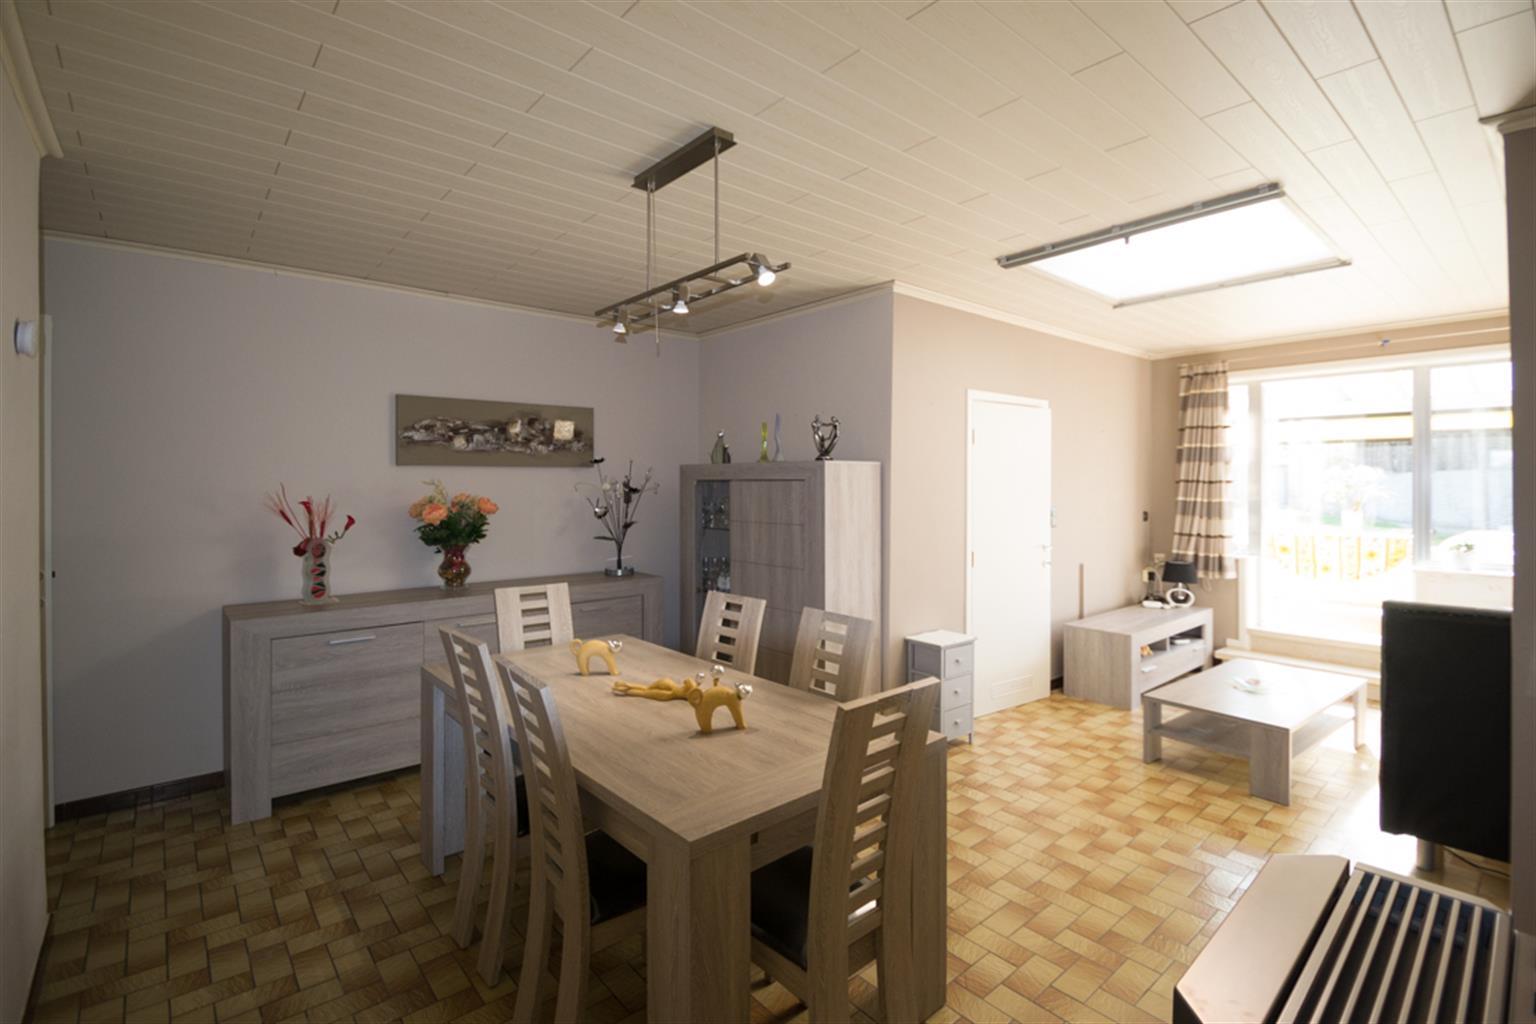 Maison - Leval-Trahegnies - #4345091-4